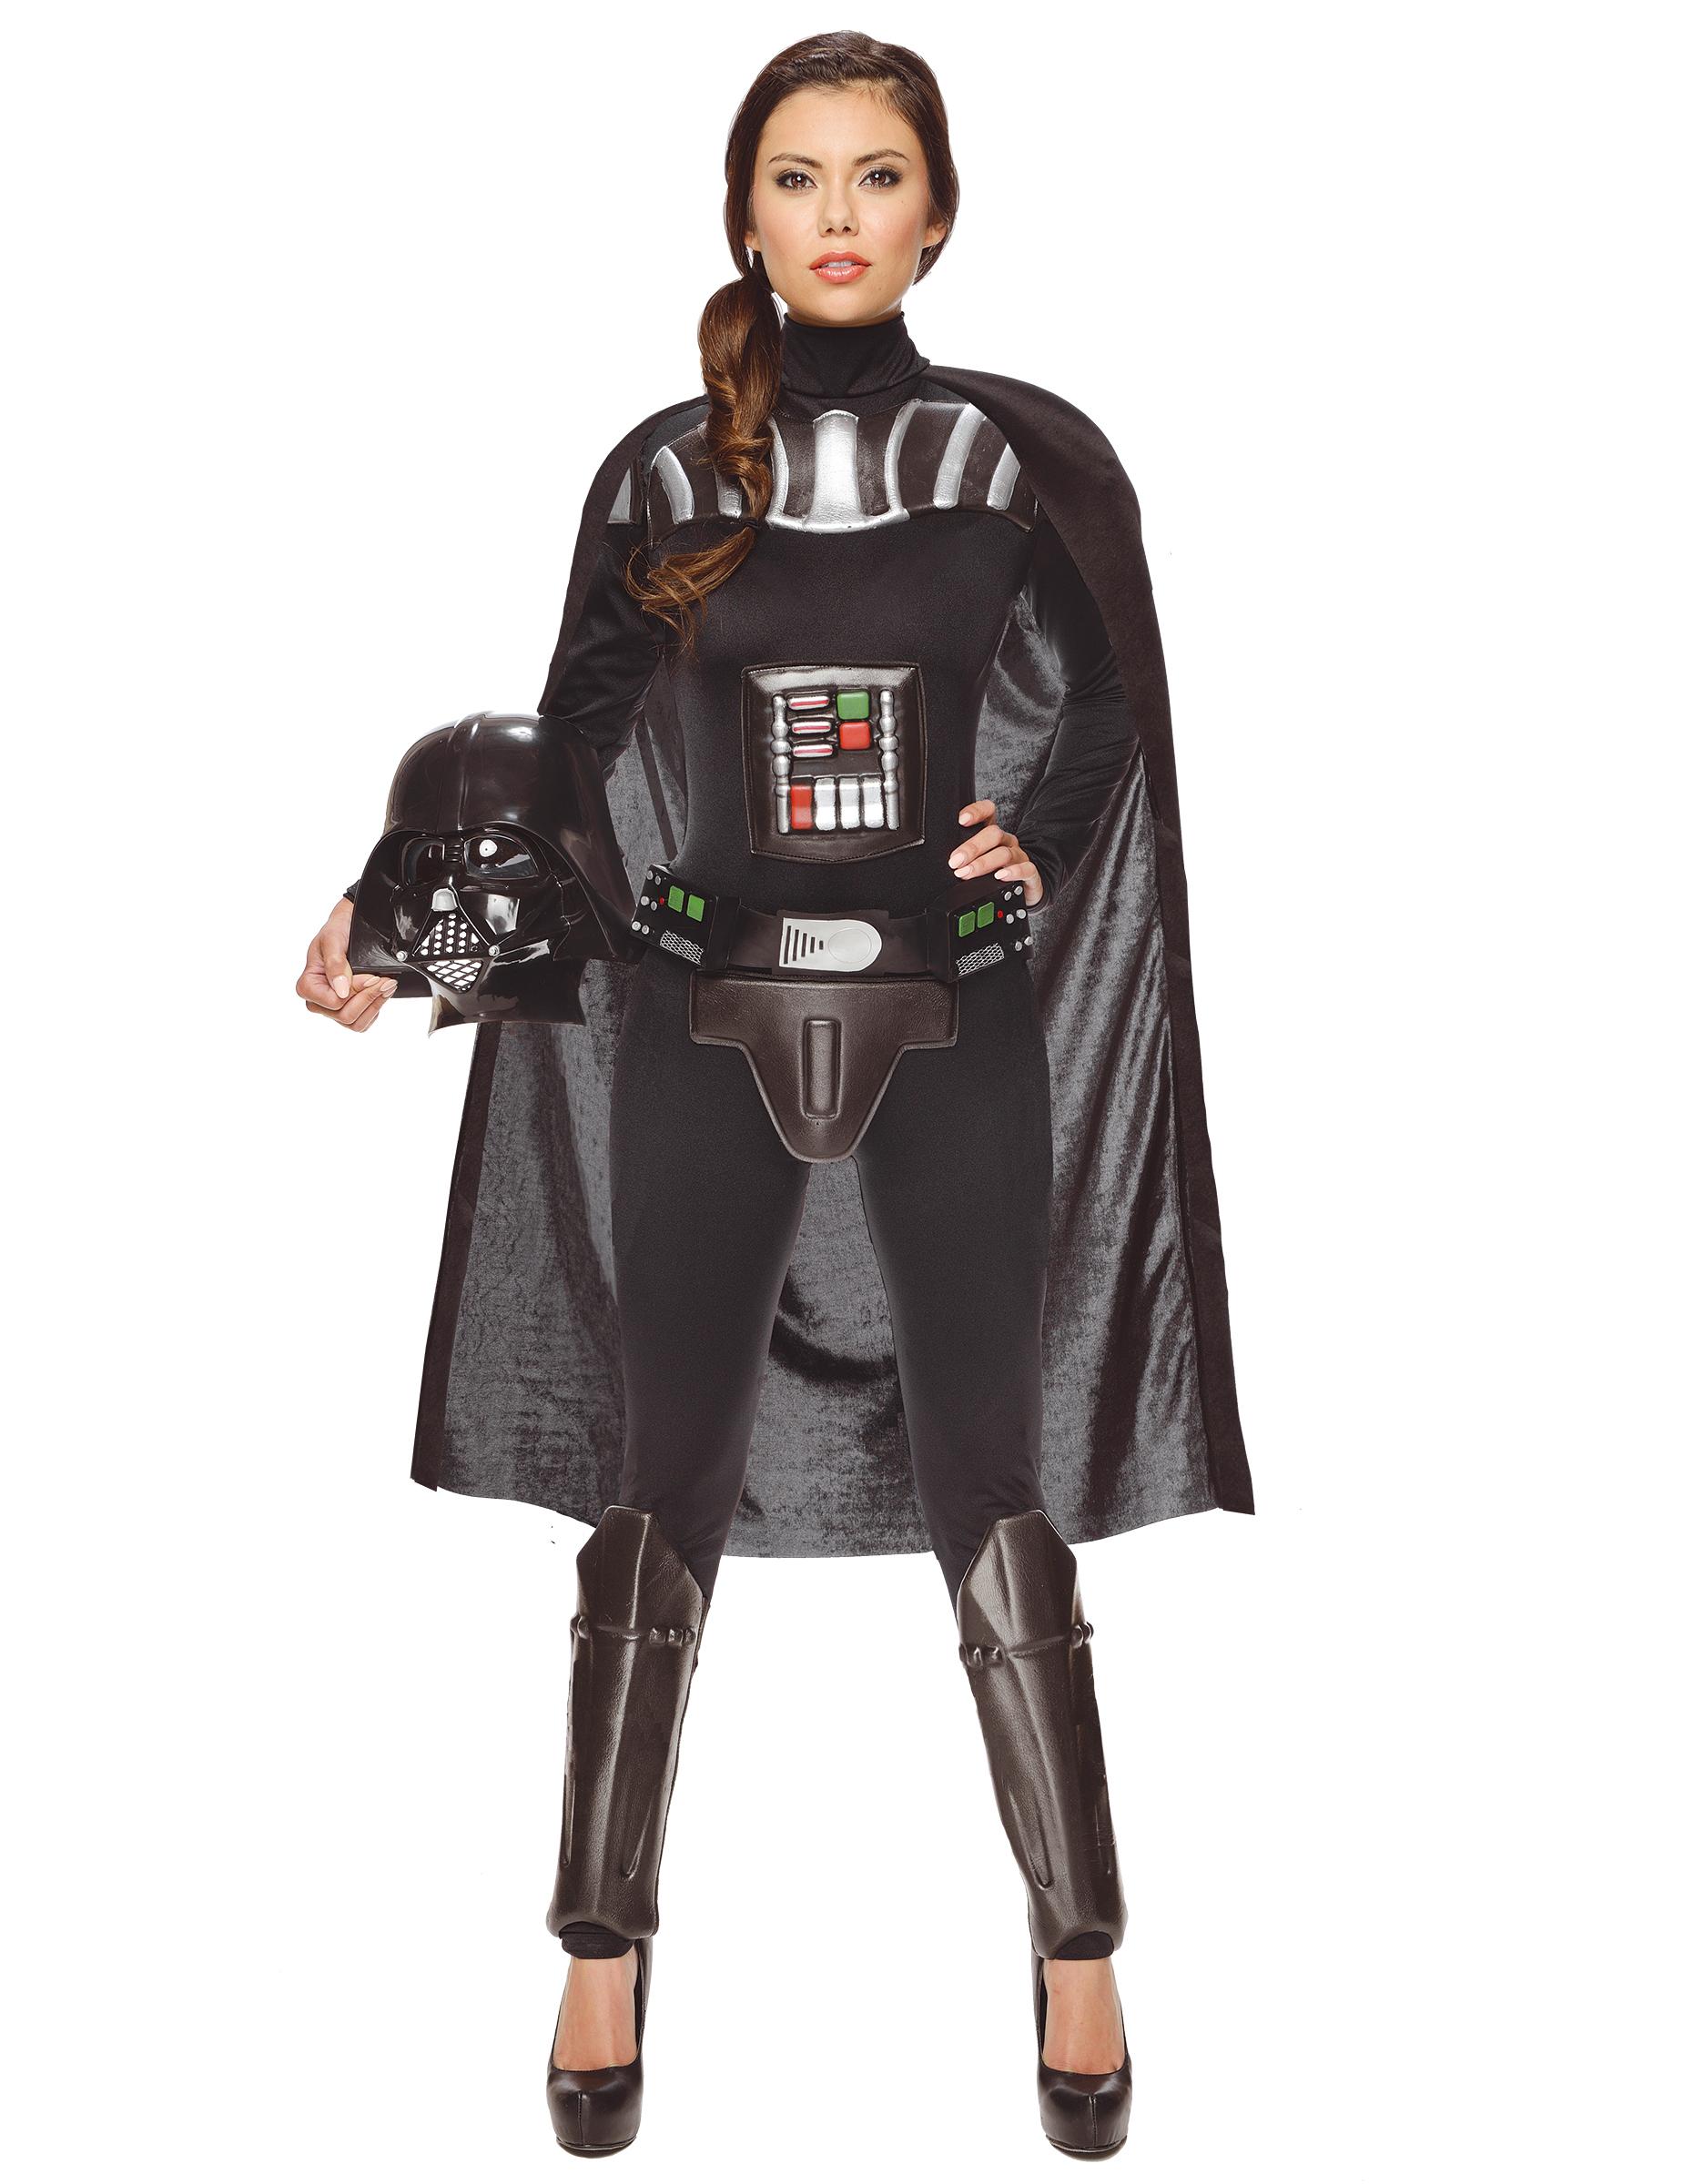 Darth Vader™-kostym i damstorlek 0239cbc02c1a0